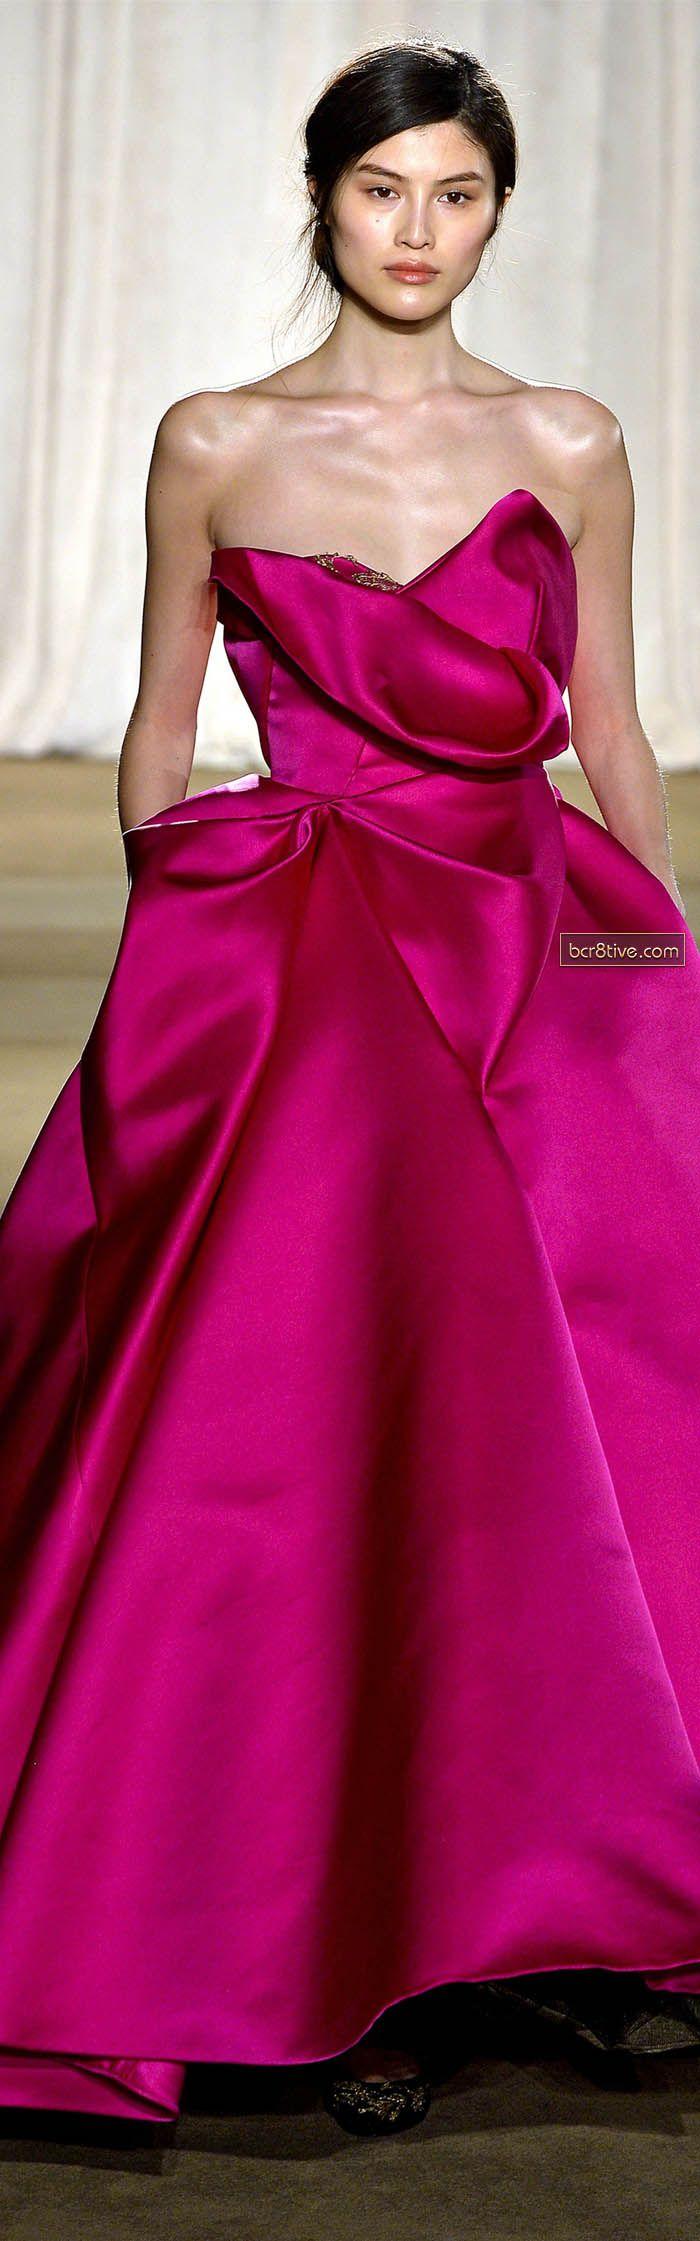 Marchesa FW 2013 at NYFW | dark pink | strapless | seamless | evening gown | high fashion